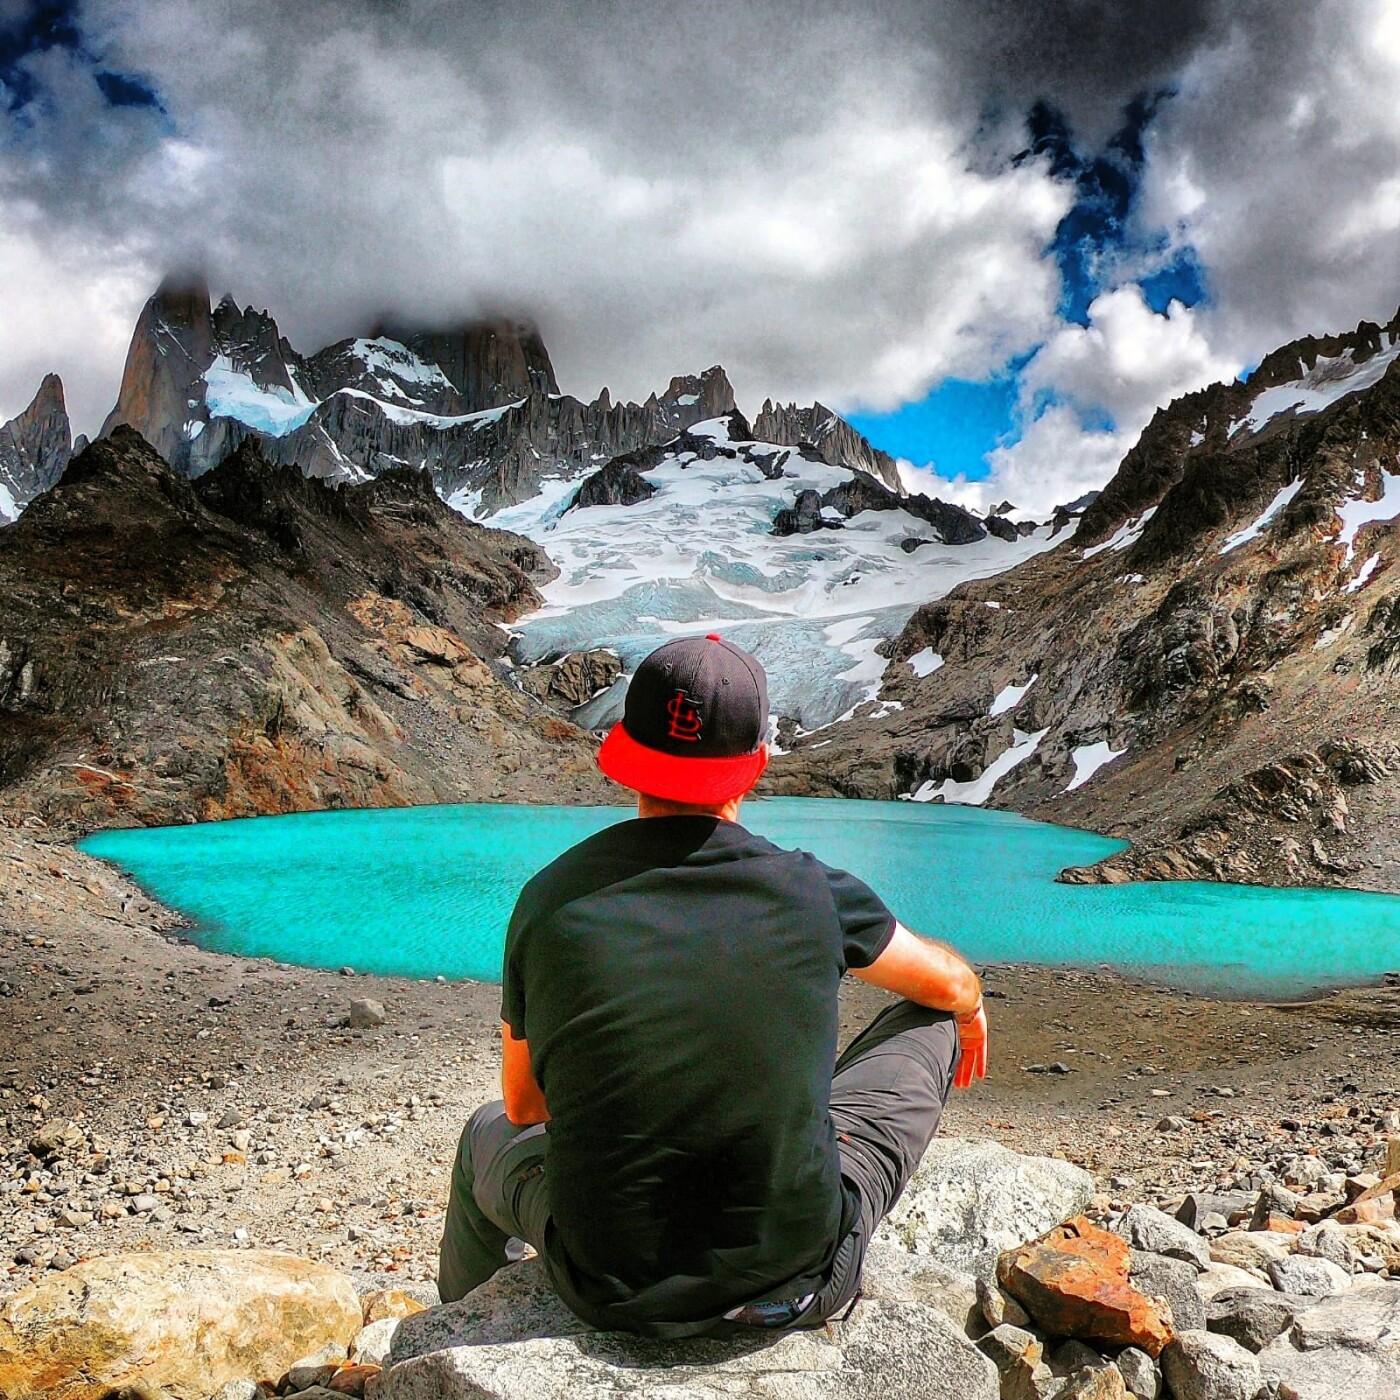 GreenWoodAntony raconte son incroyable retour de Patagonie avec l'arrivée de la Covid - Globe Trotter 12 05 - Mars 2021 - StereoChic Radio